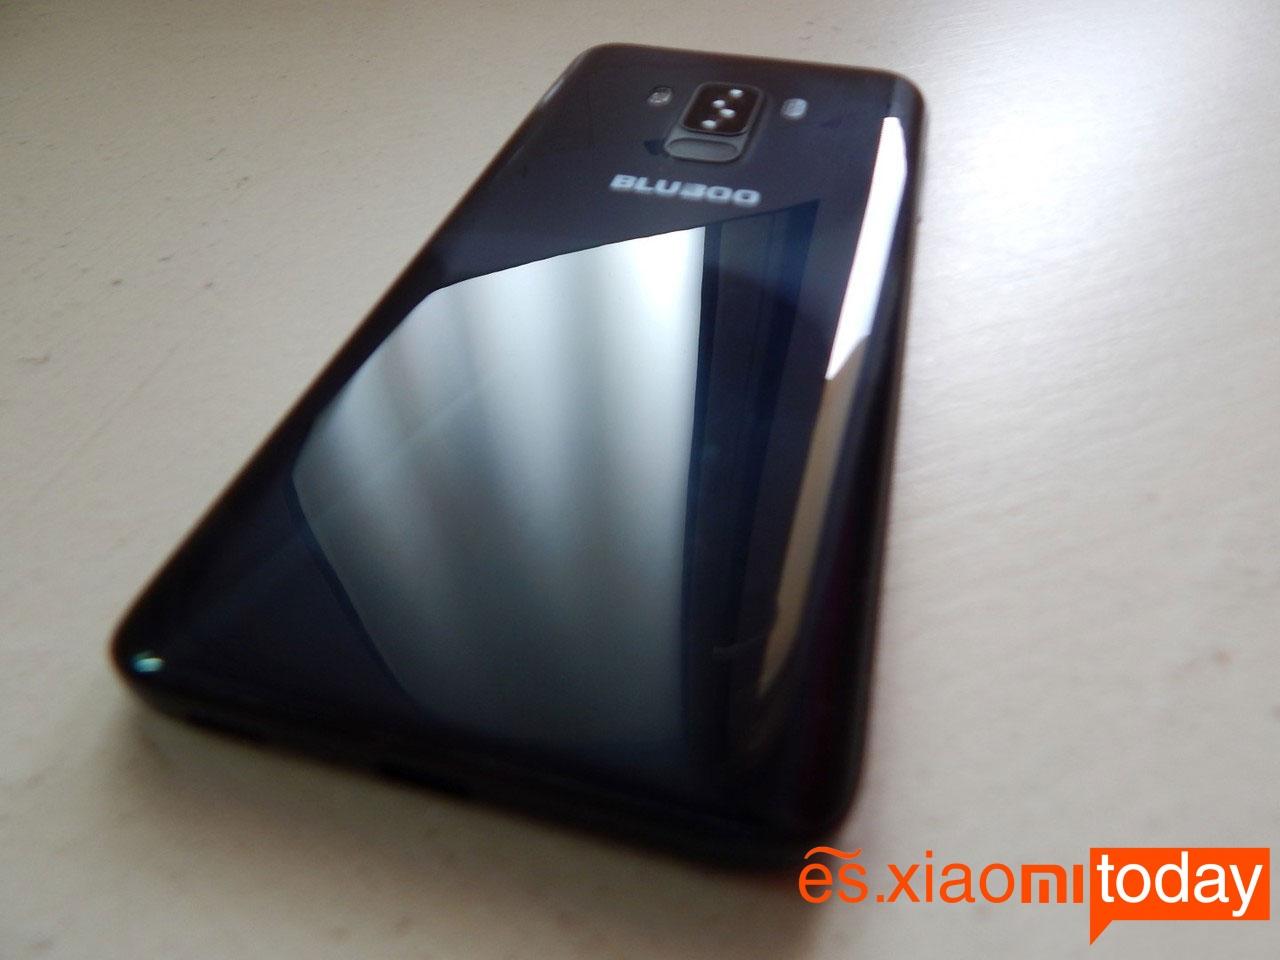 Bluboo S8 hardware